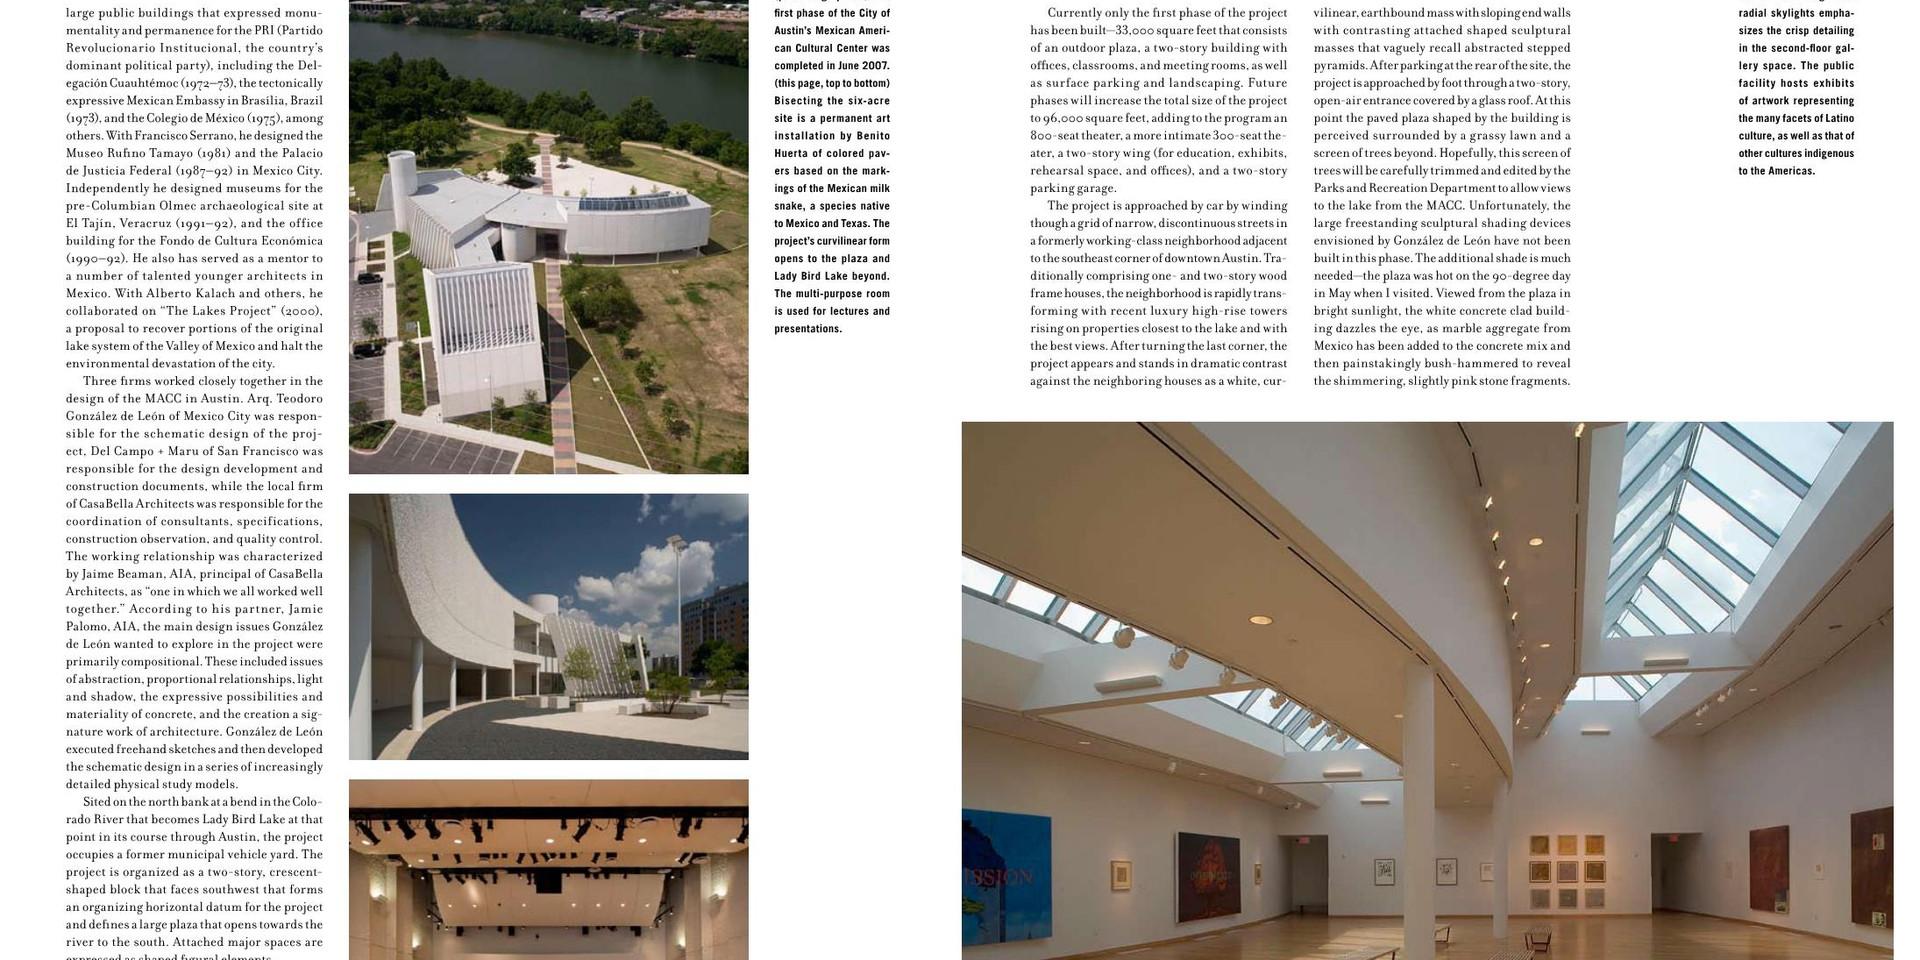 Texas Architect MACC Page 002.jpg